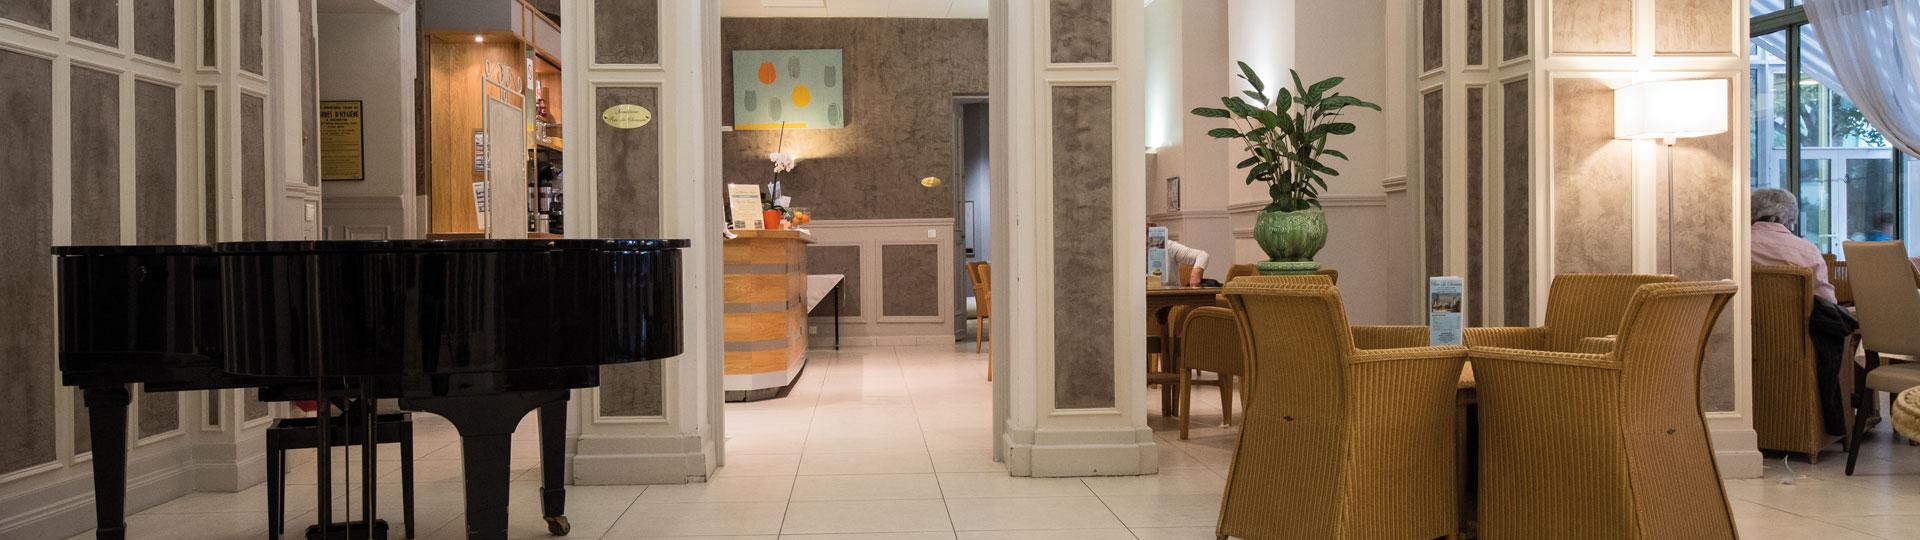 Bar le Banian - Hôtel Royal Westminster